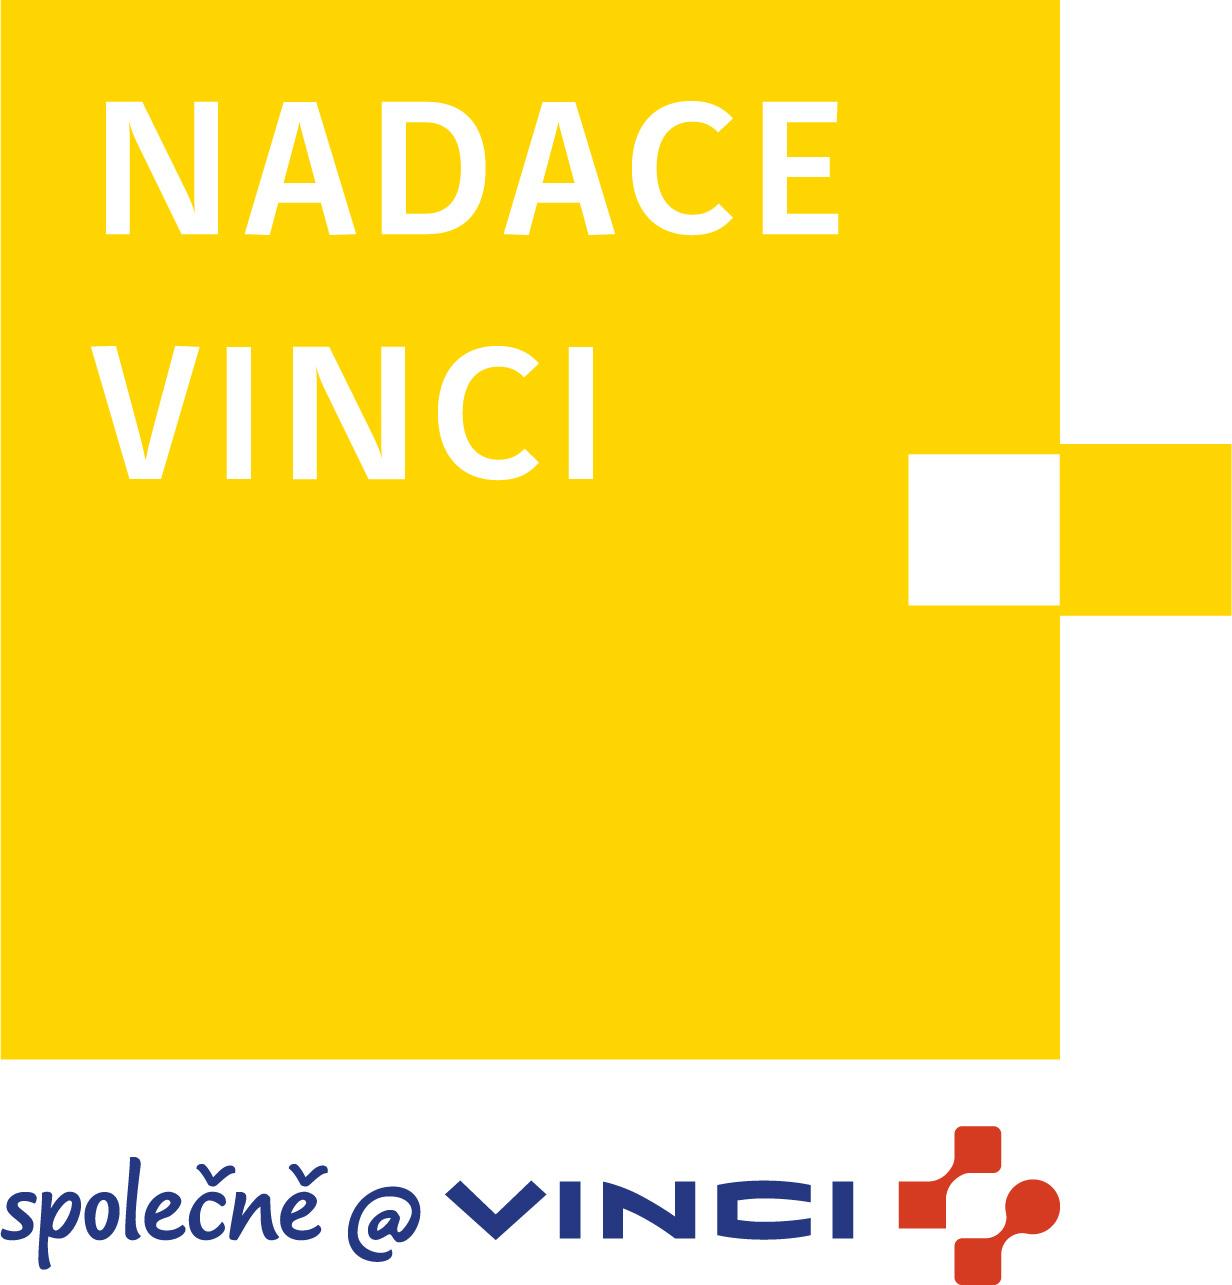 LOGO_NADACE_VINCI_2